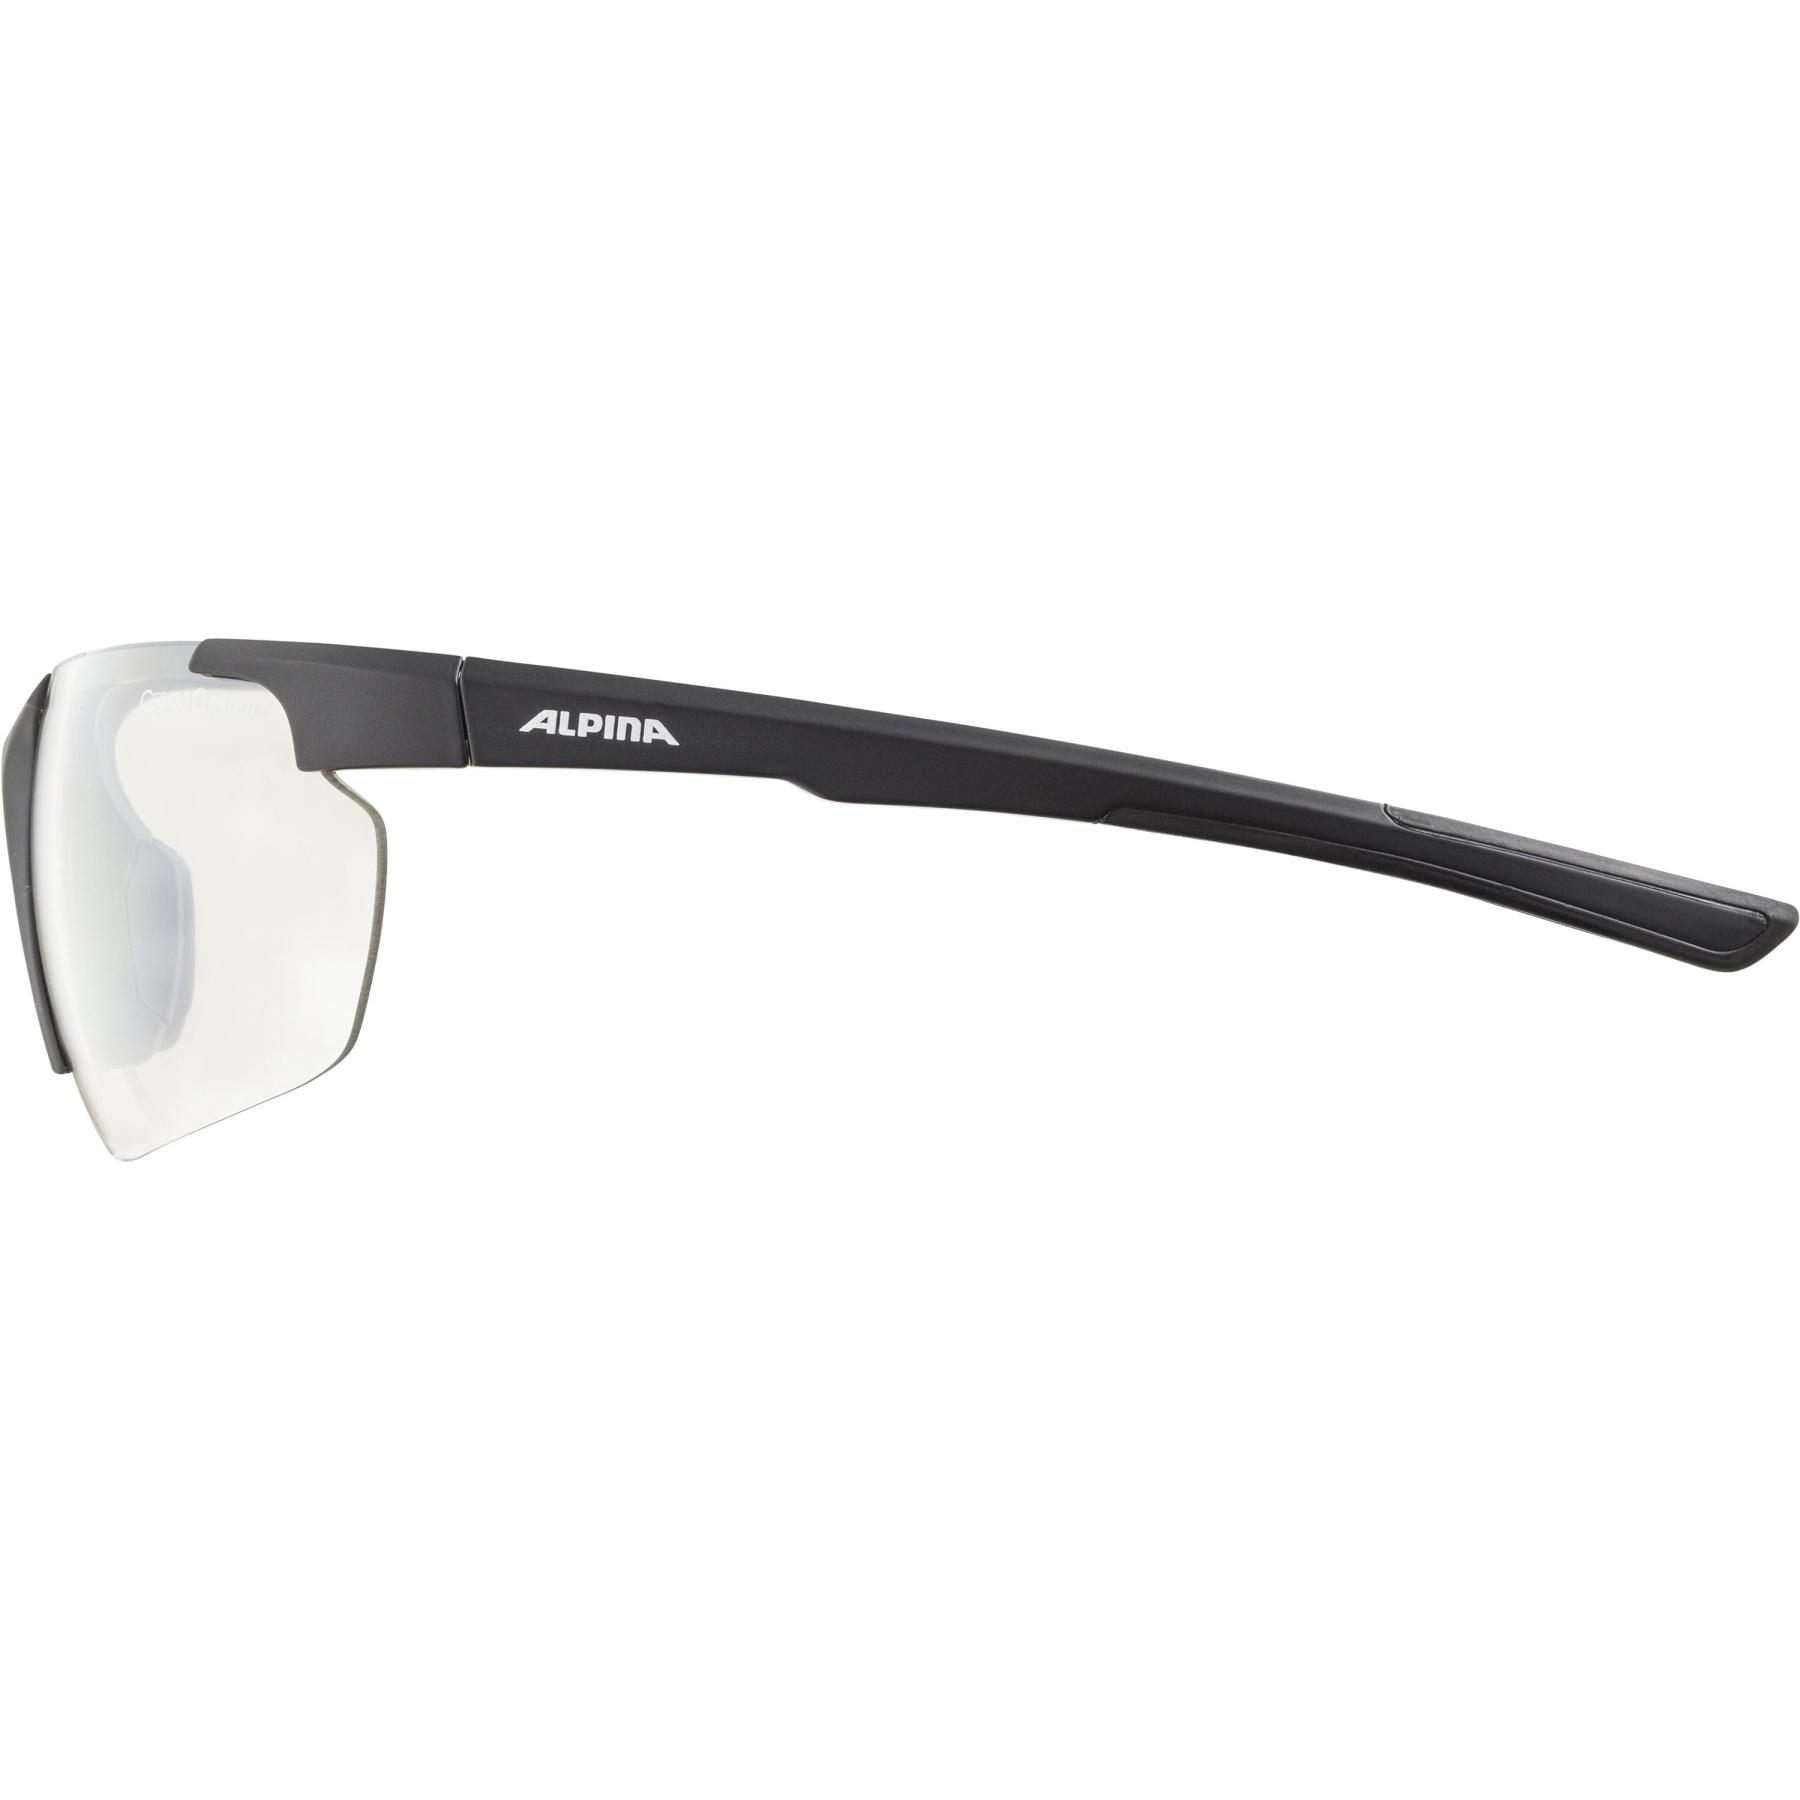 Image of Alpina Defey HR Glasses - black matt / clear mirror